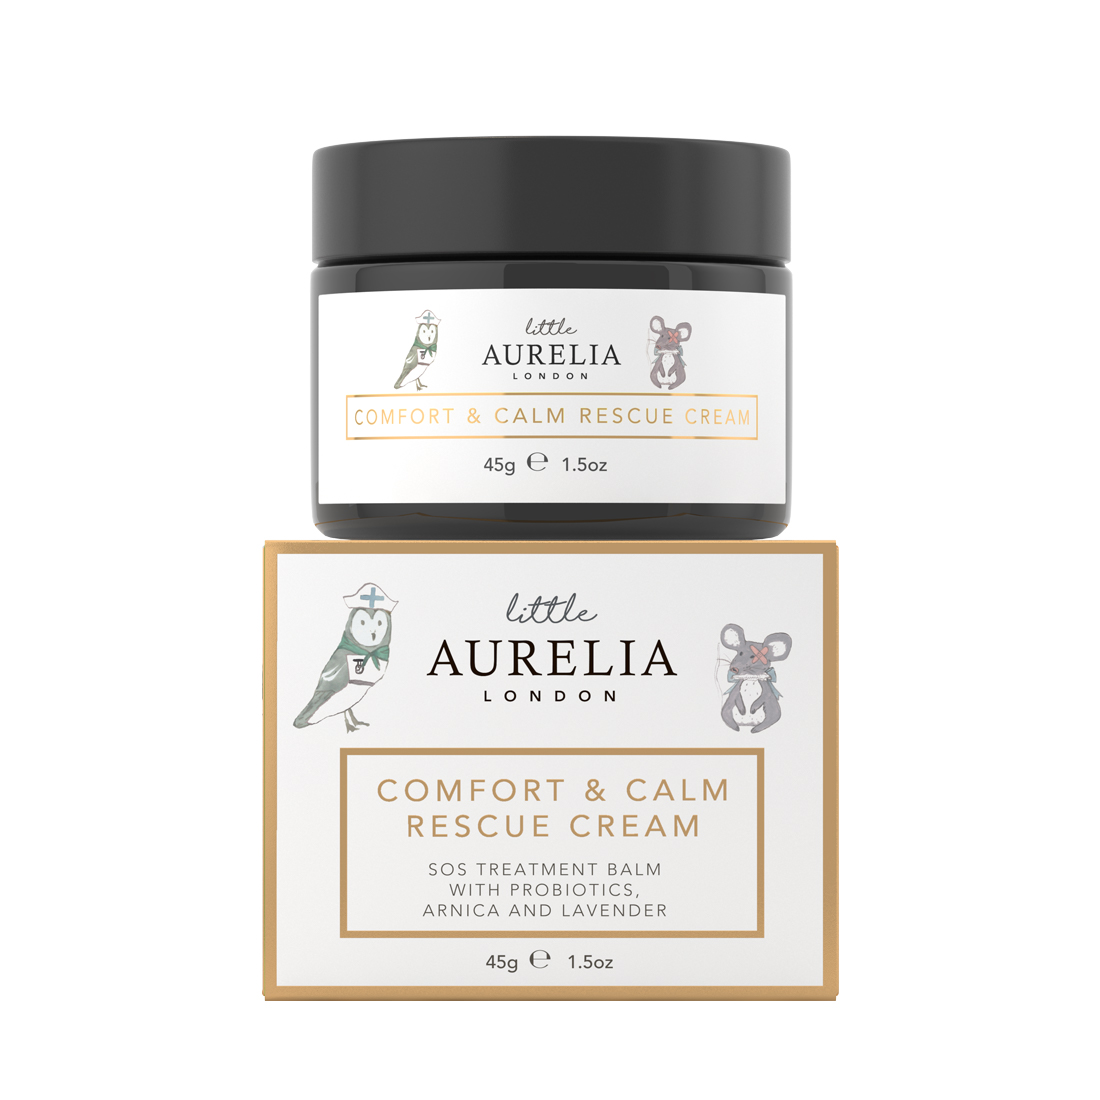 An image of Comfort & Calm Rescue Cream for Babies 45g Little Aurelia